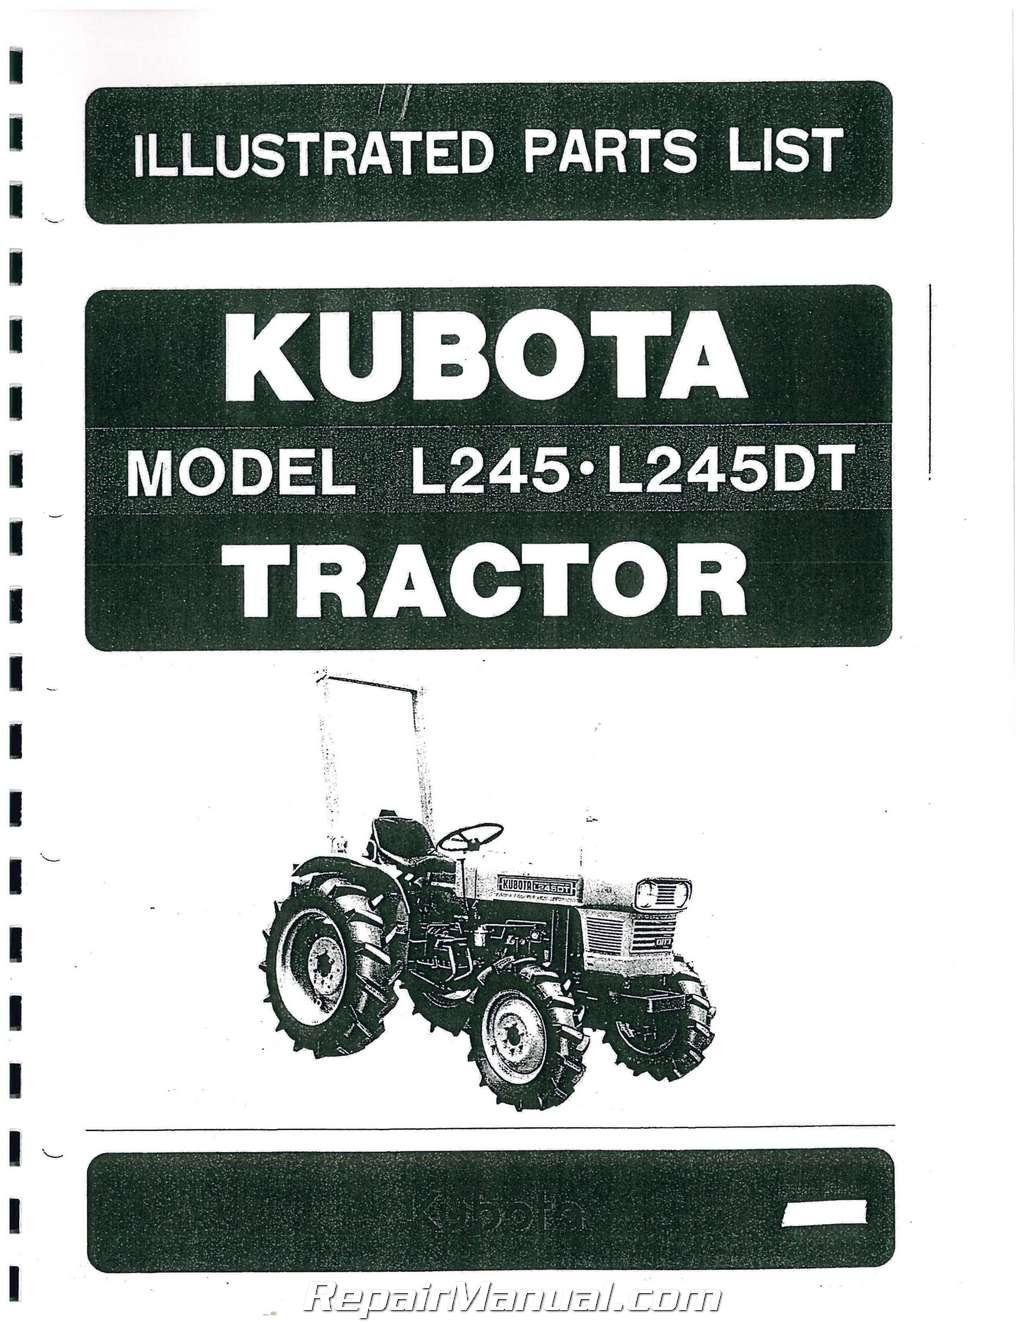 Kubota L245 Tractor Parts : Kubota l dt dsl wd tractor parts manual